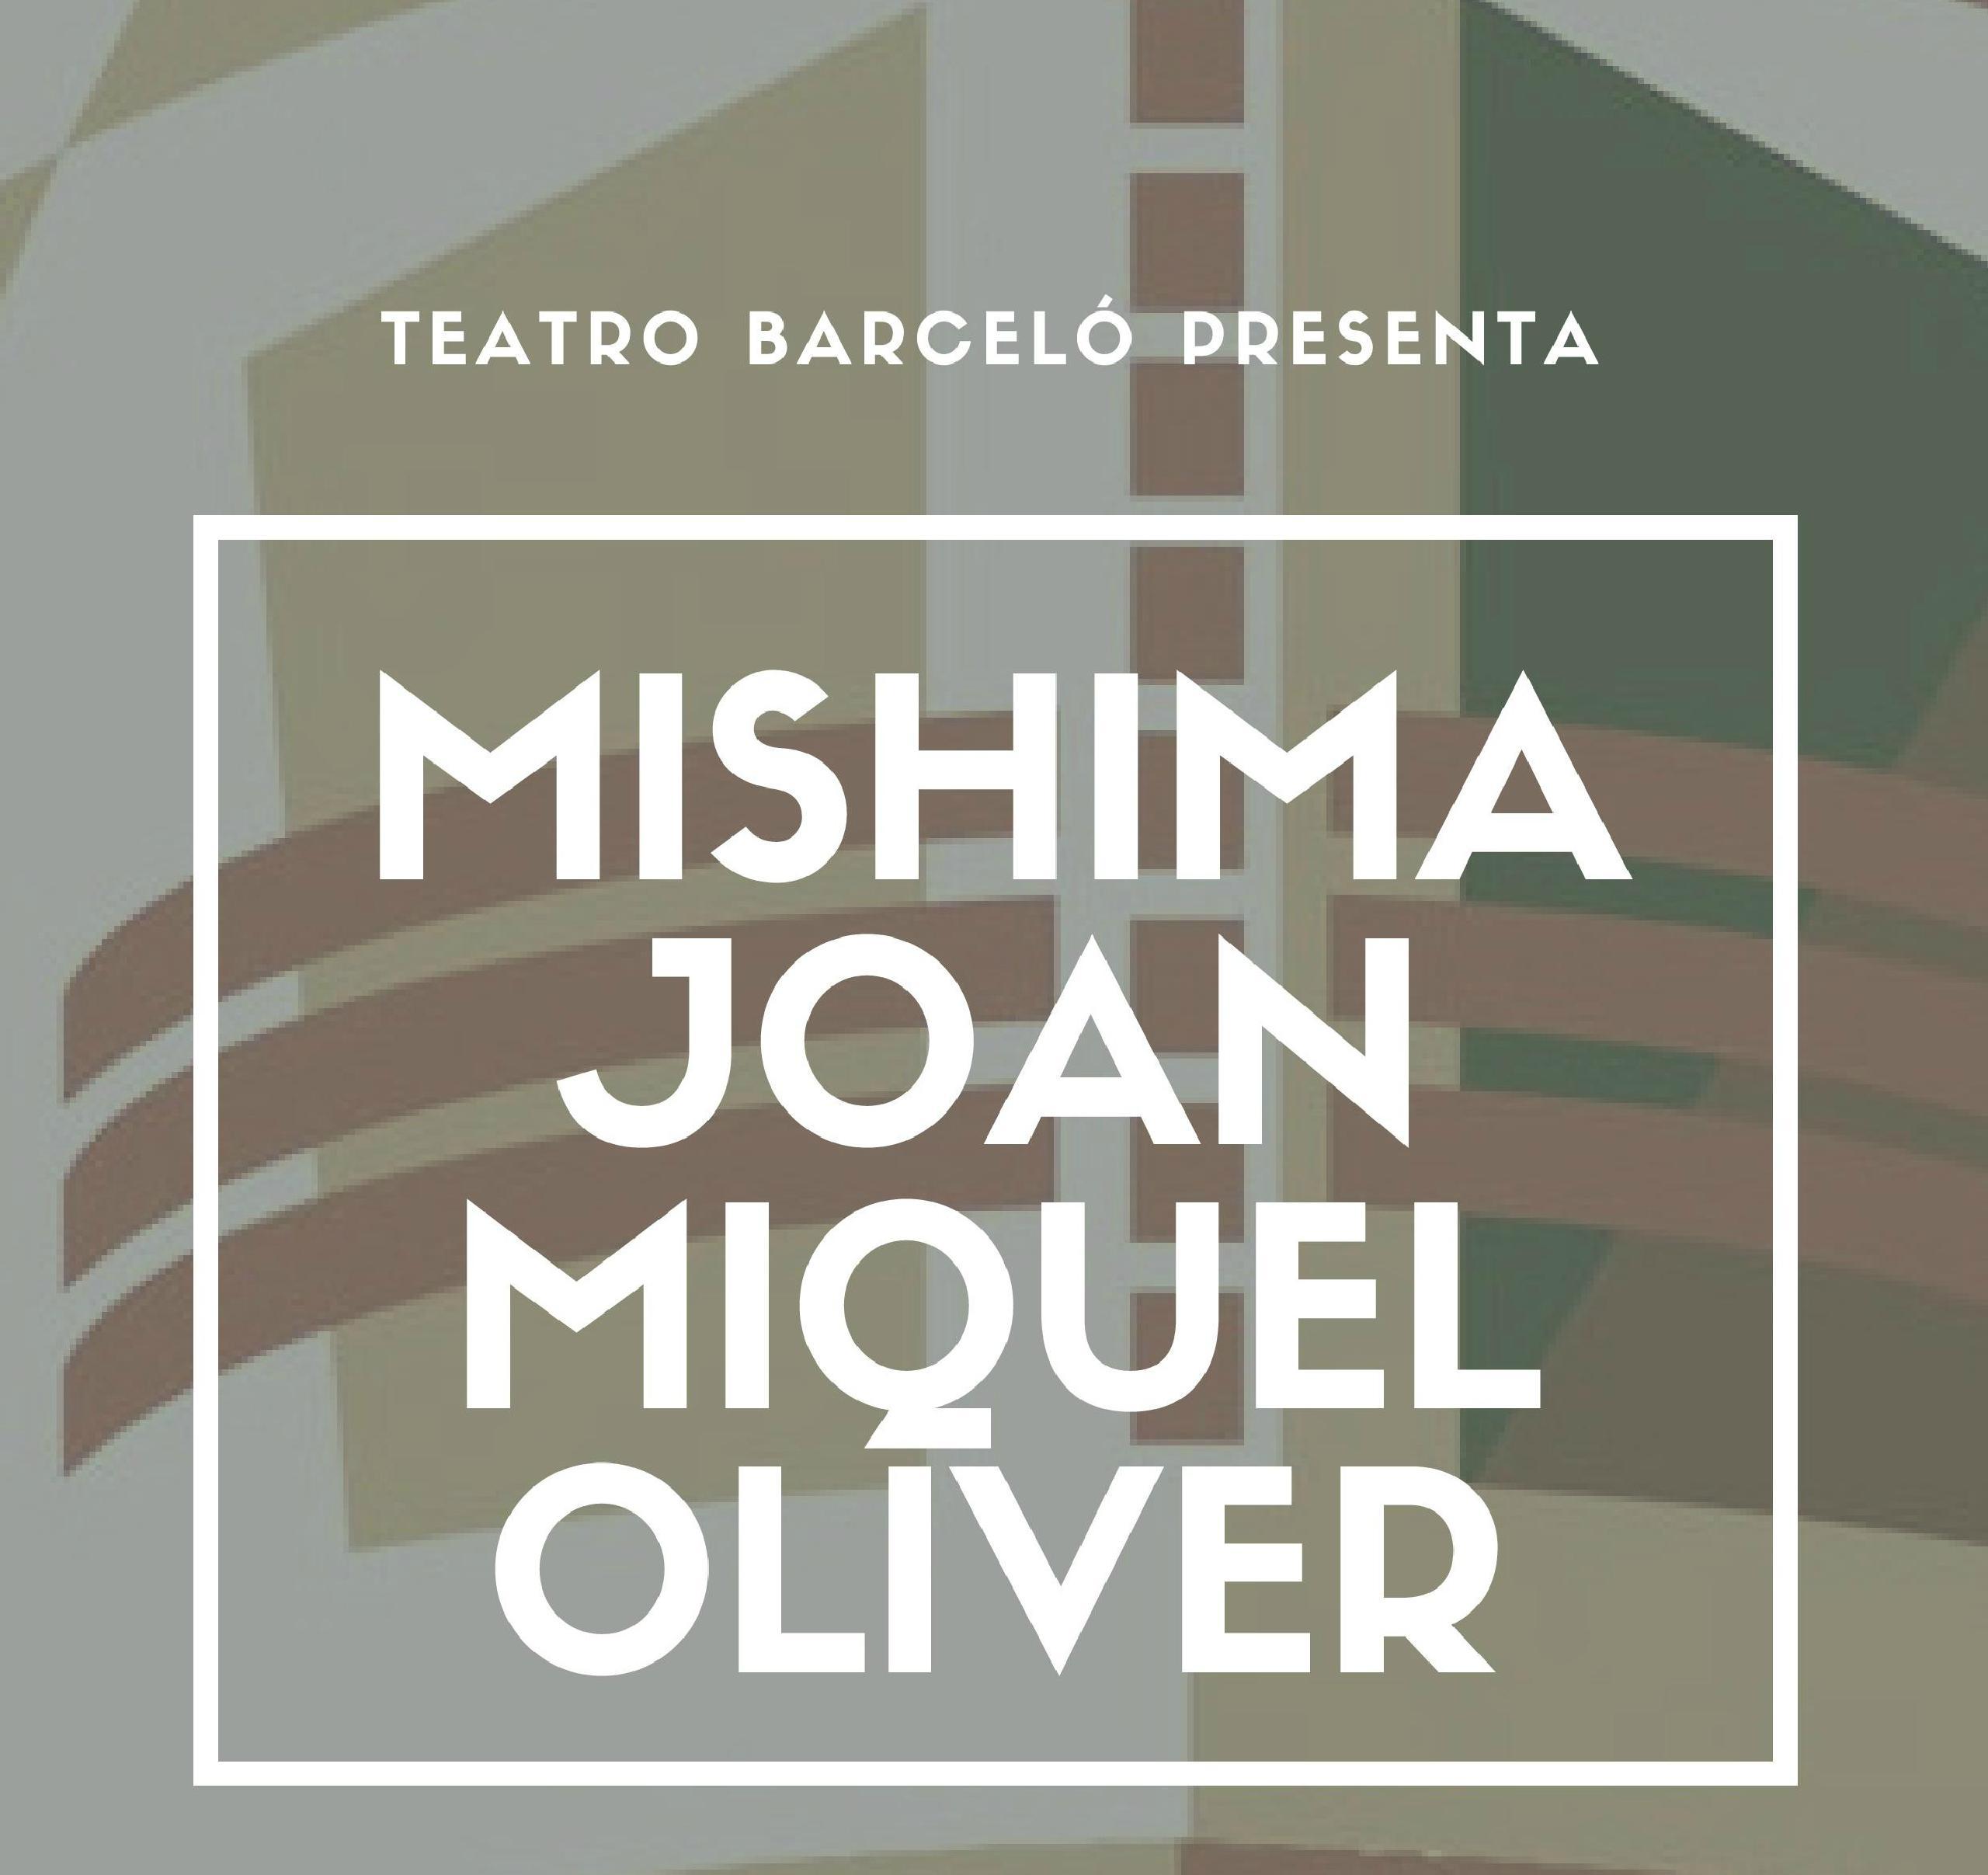 Teatro Barceló presenta: Mishima + Joan Miquel Oliver